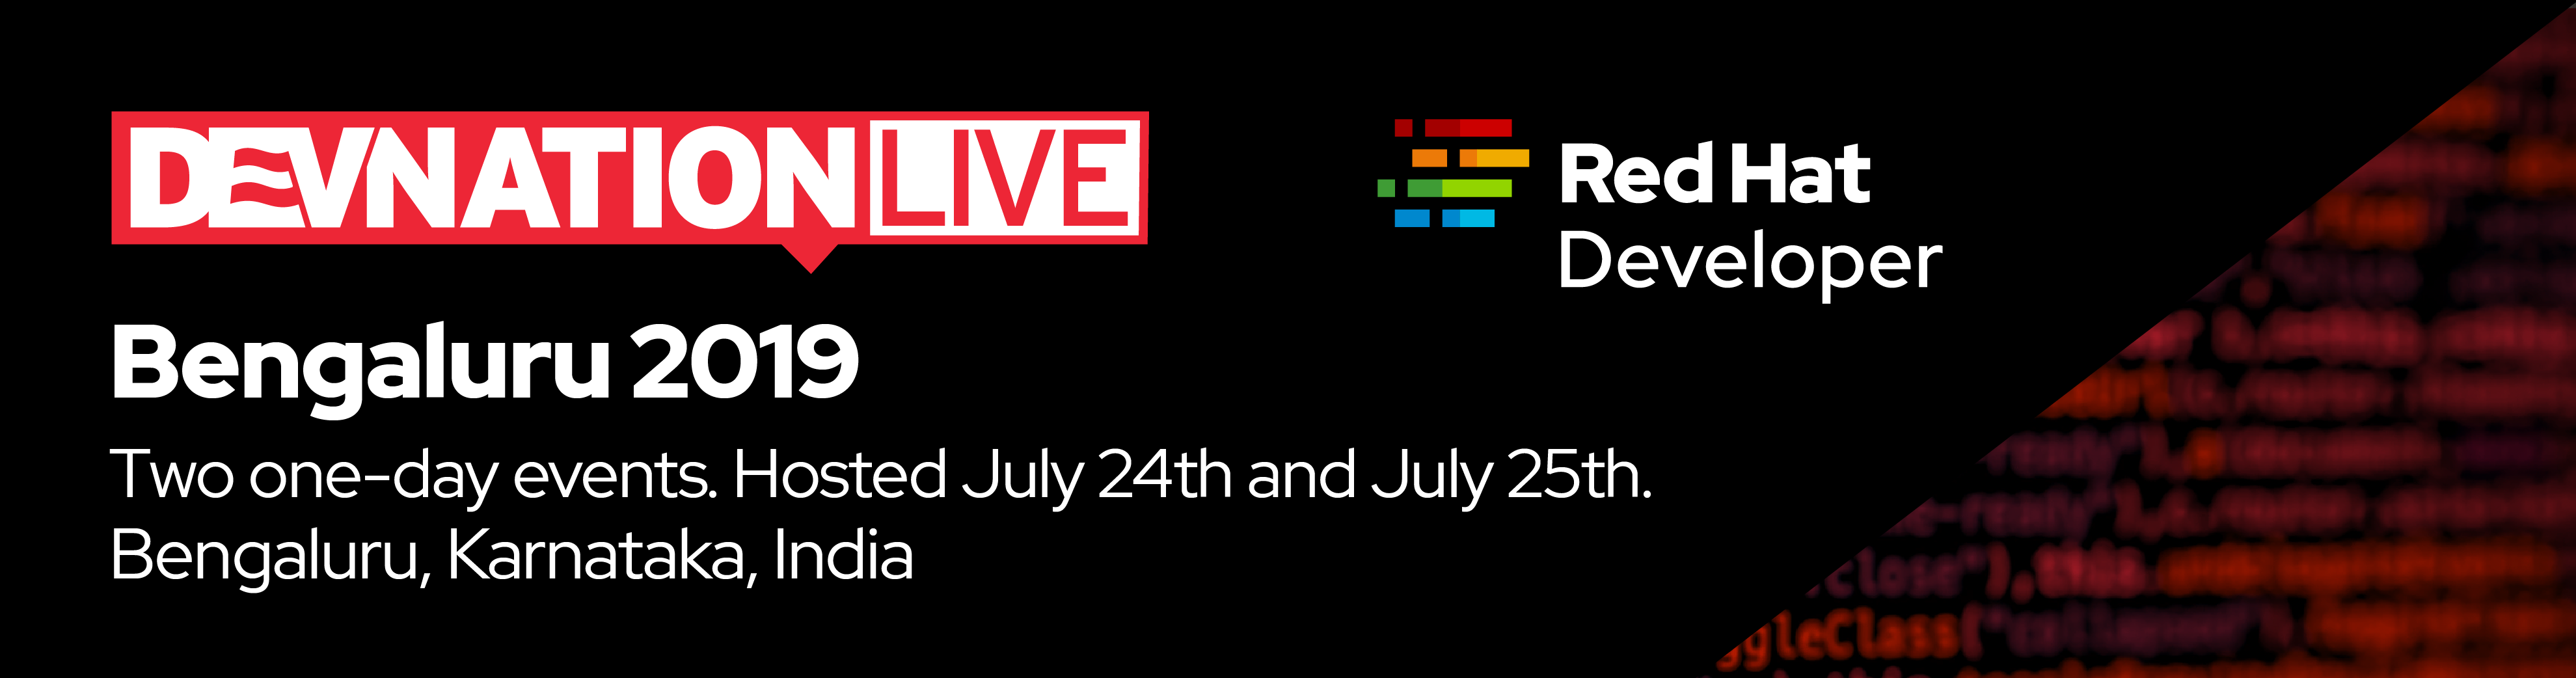 DevNation LIVE Bengaluru 2019